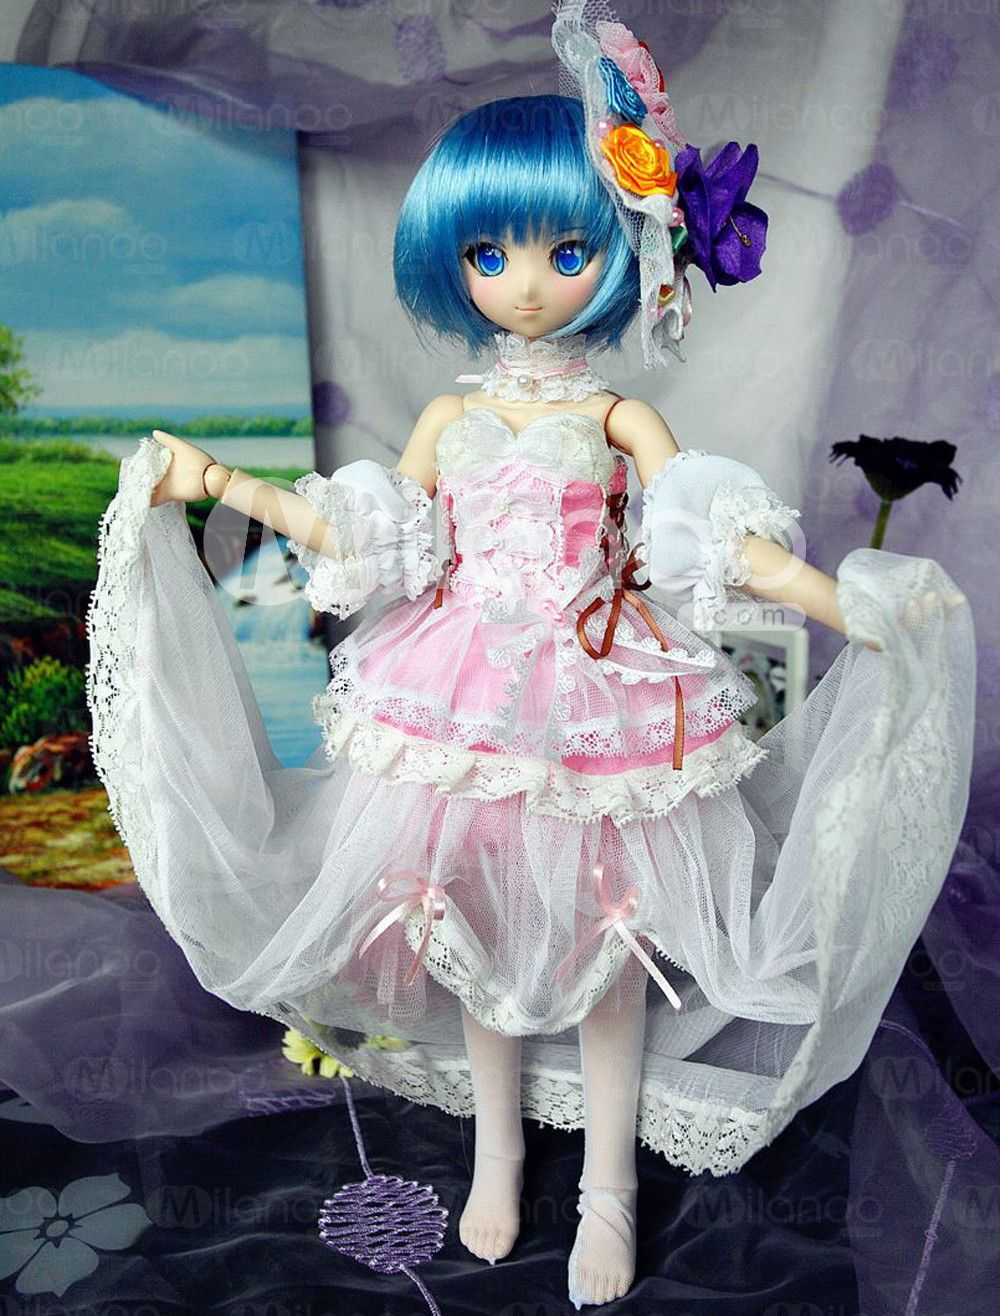 Sweet Pink Cotton BJD Doll Western Style Cloth - Milanoo.com